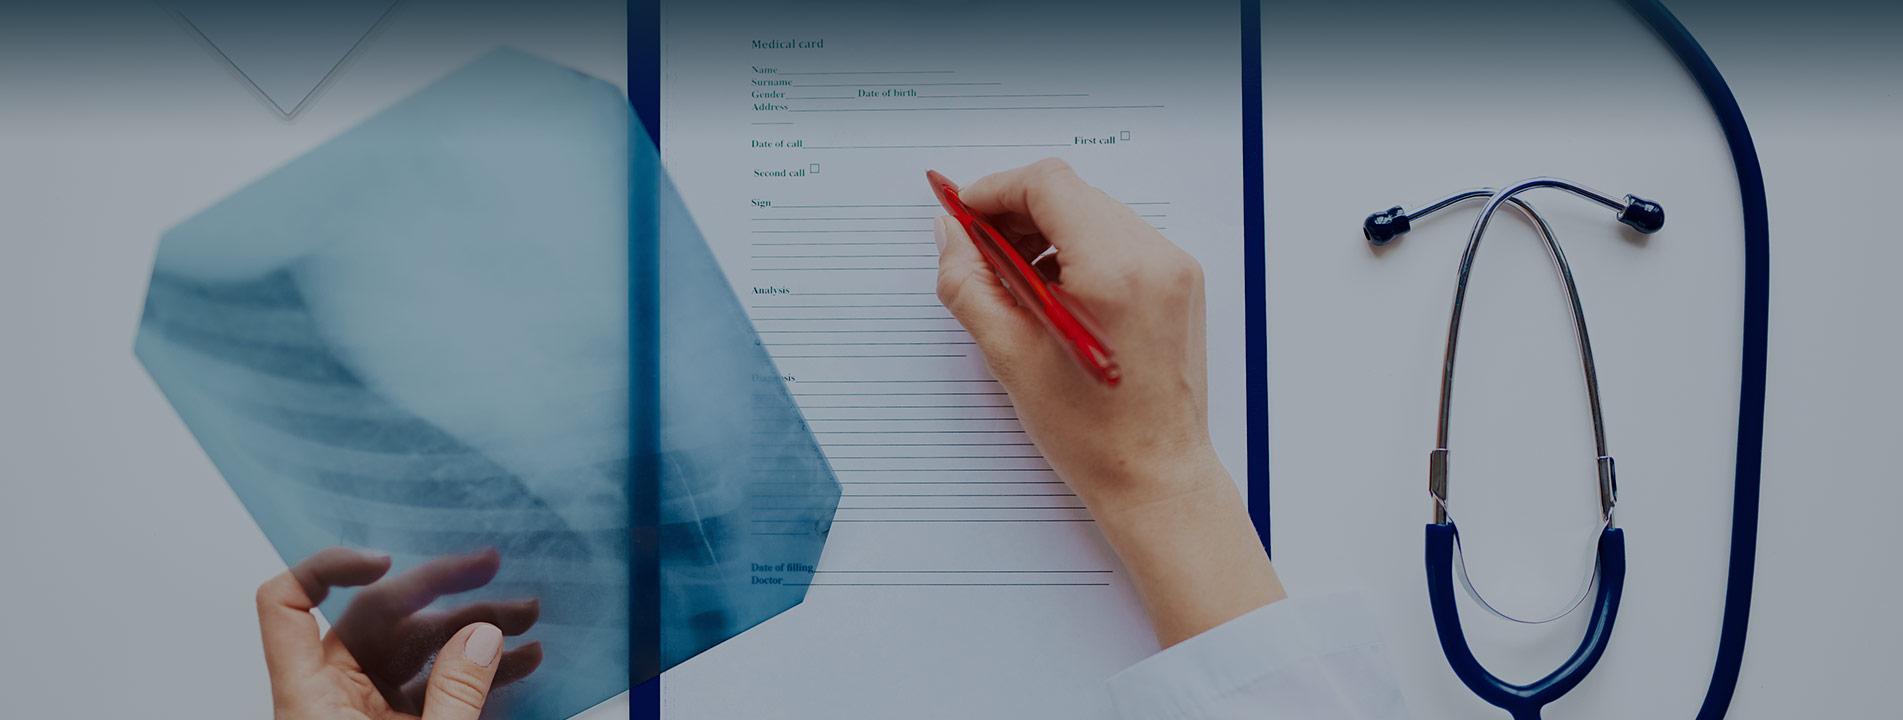 certificado-medico-certimedic-slider-3